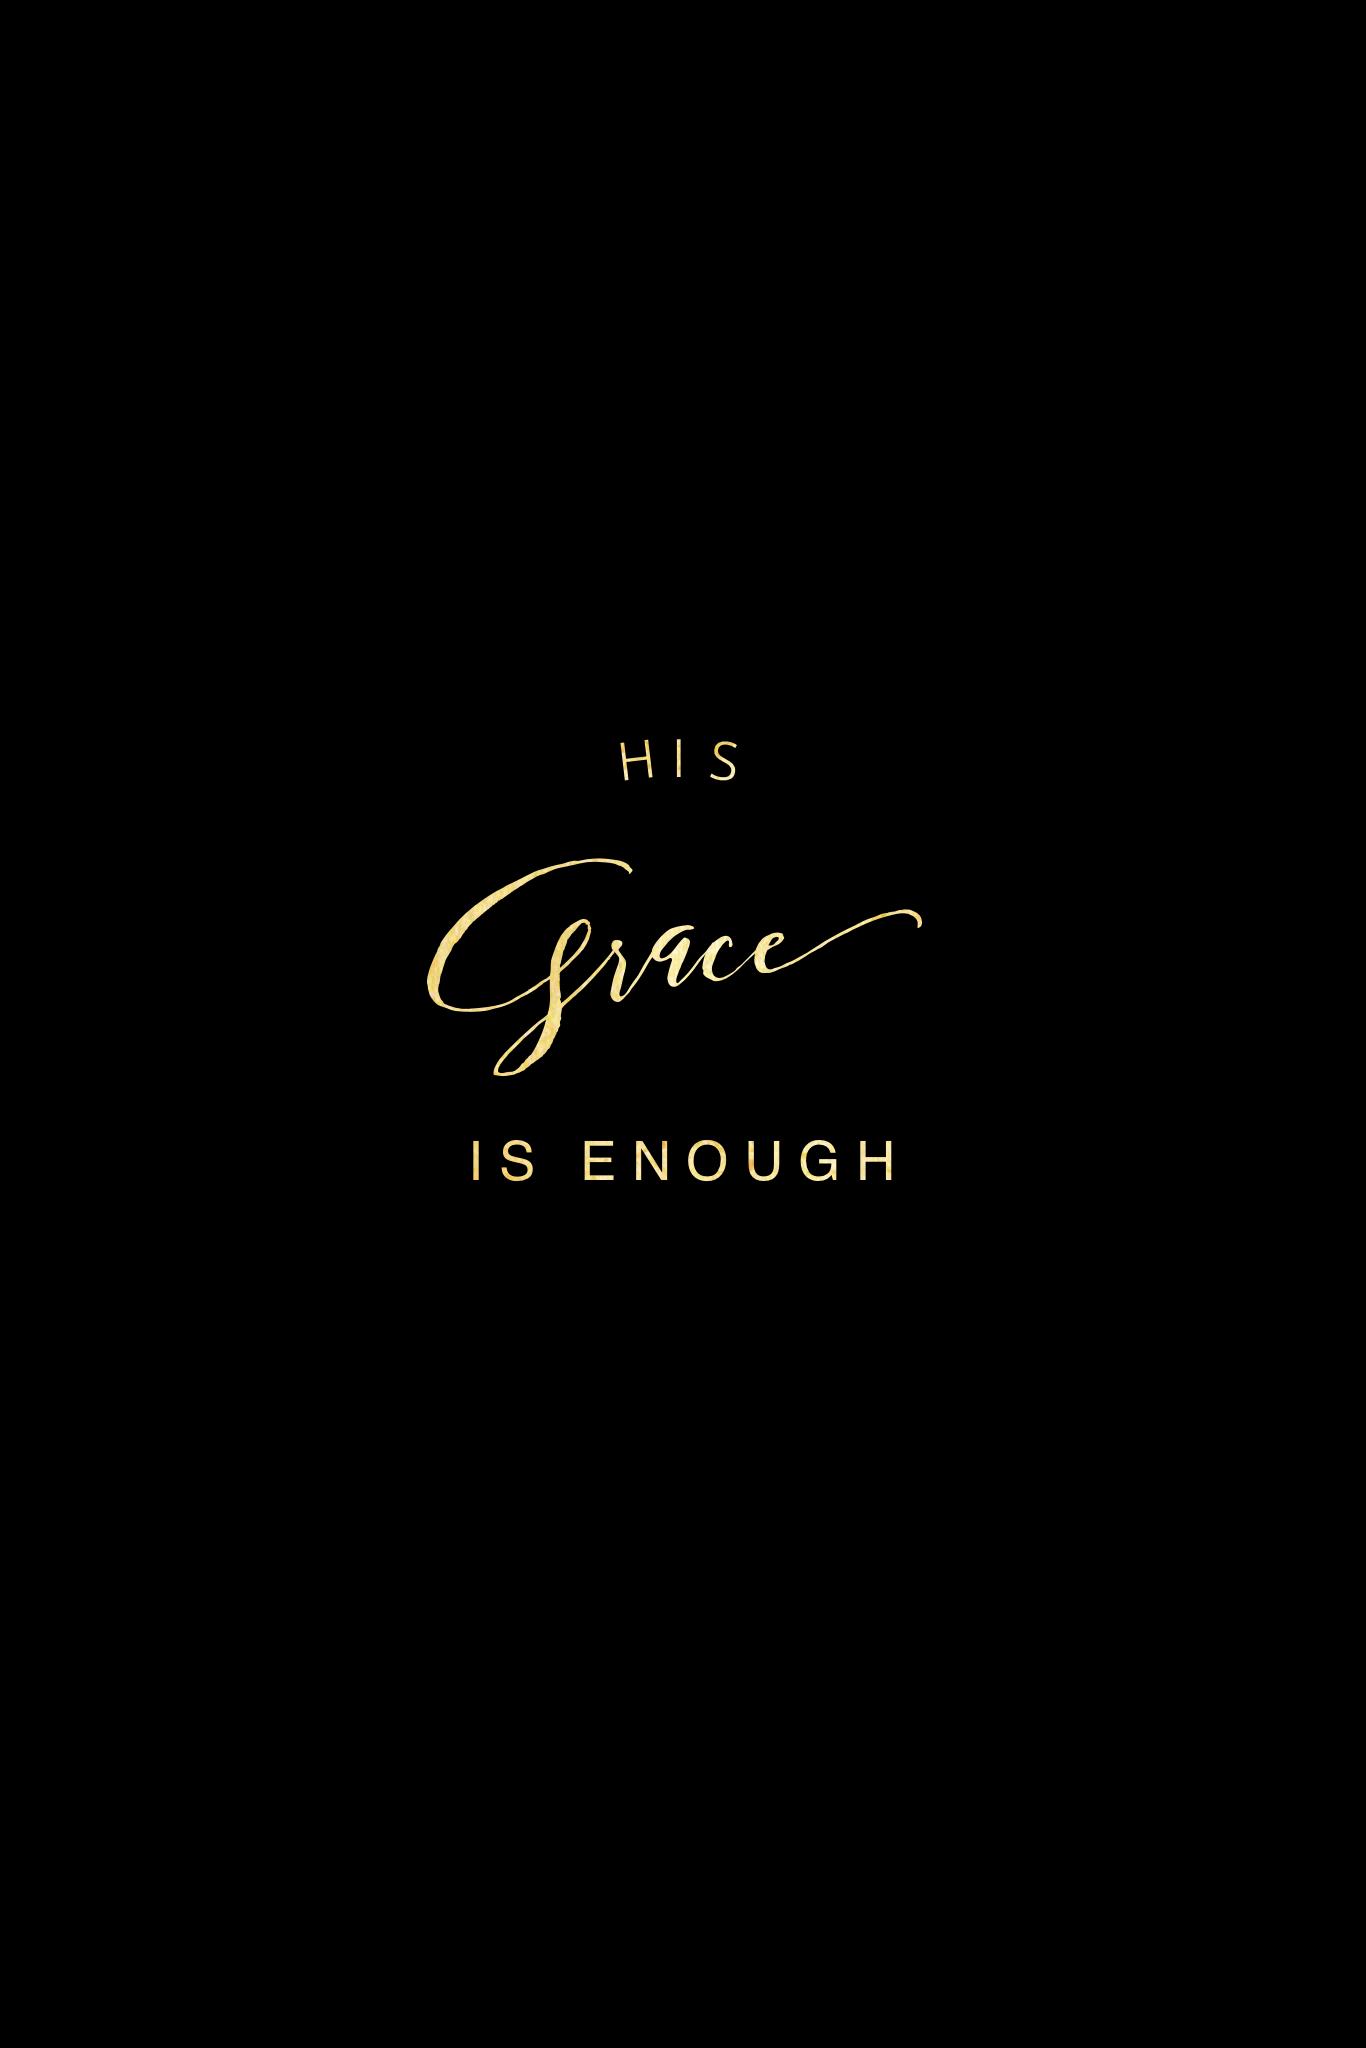 His Grace Is Enough Christian Quotes Grace